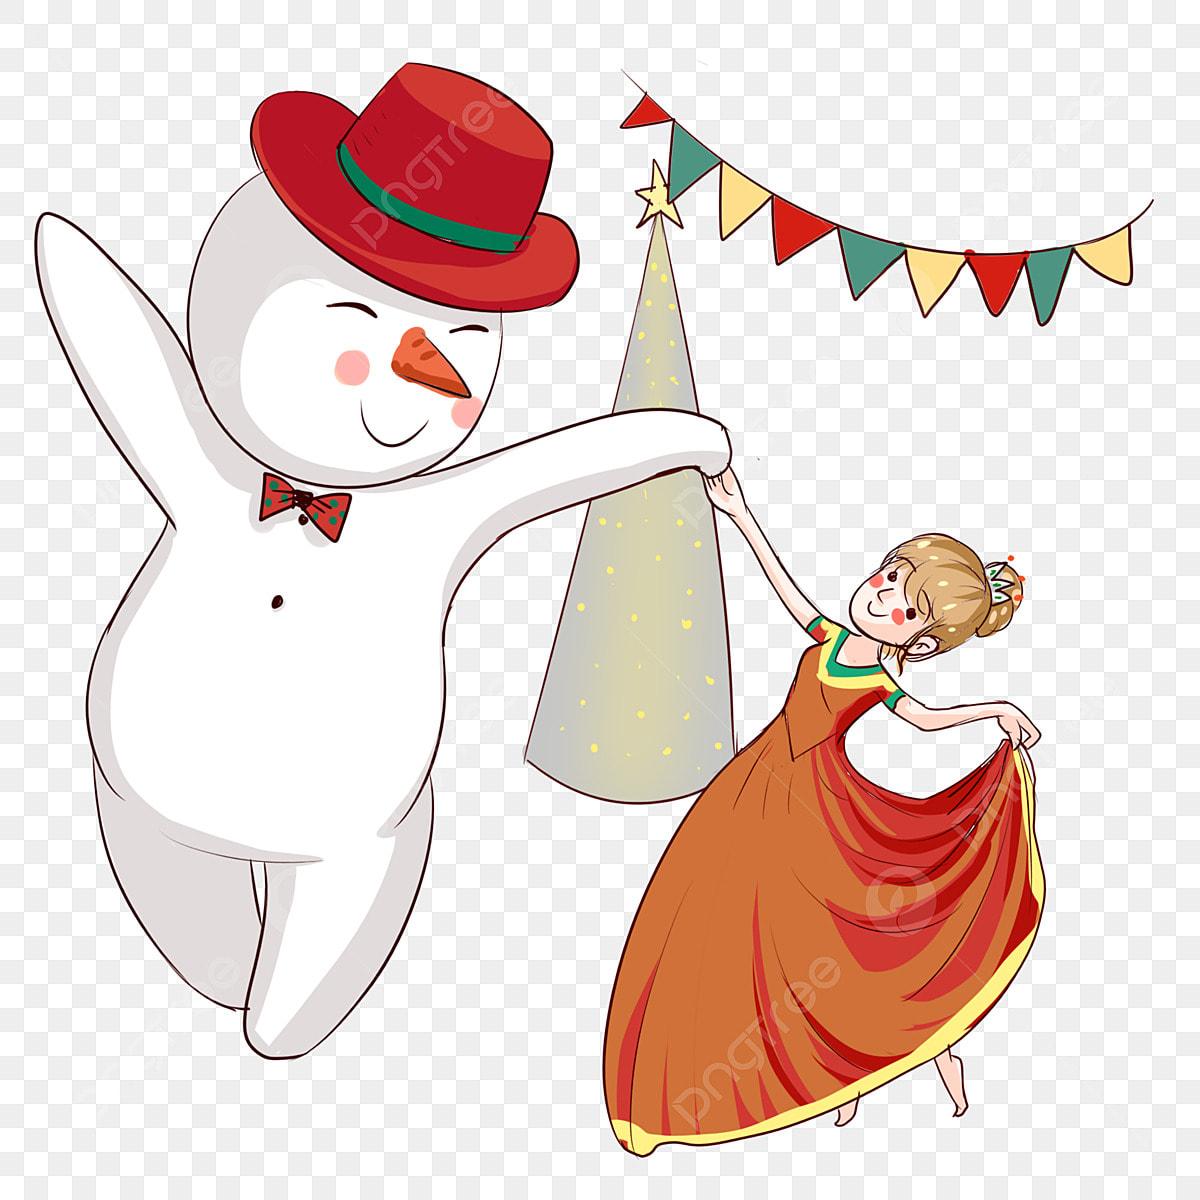 Christmas Dancing Cartoon.Christmas Ball Snowman Hand Drawn Snowman Cartoon Girl